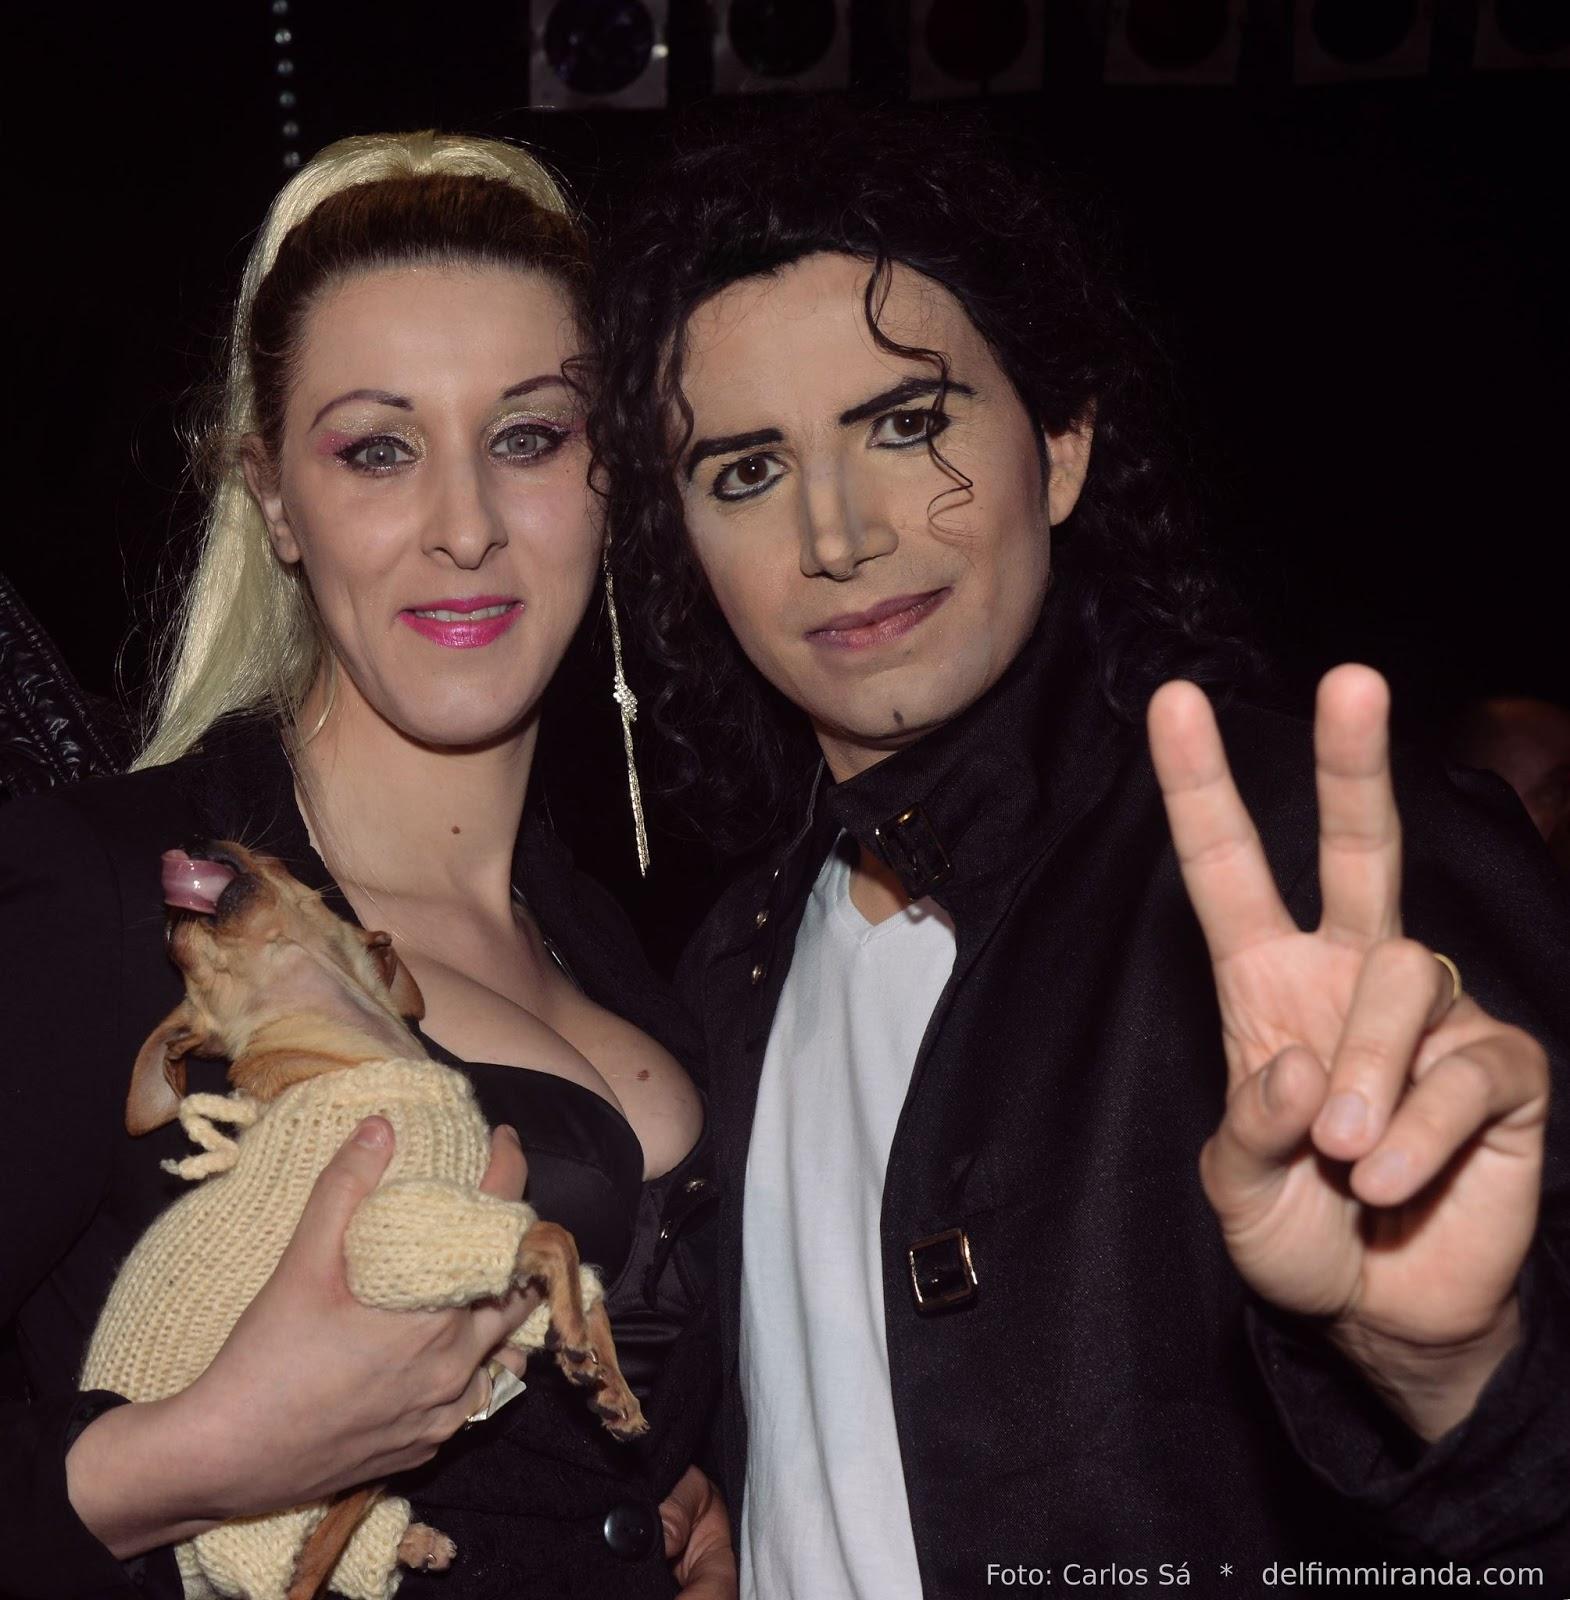 Delfim Miranda - Michael Jackson Tribute - With singer Nikita